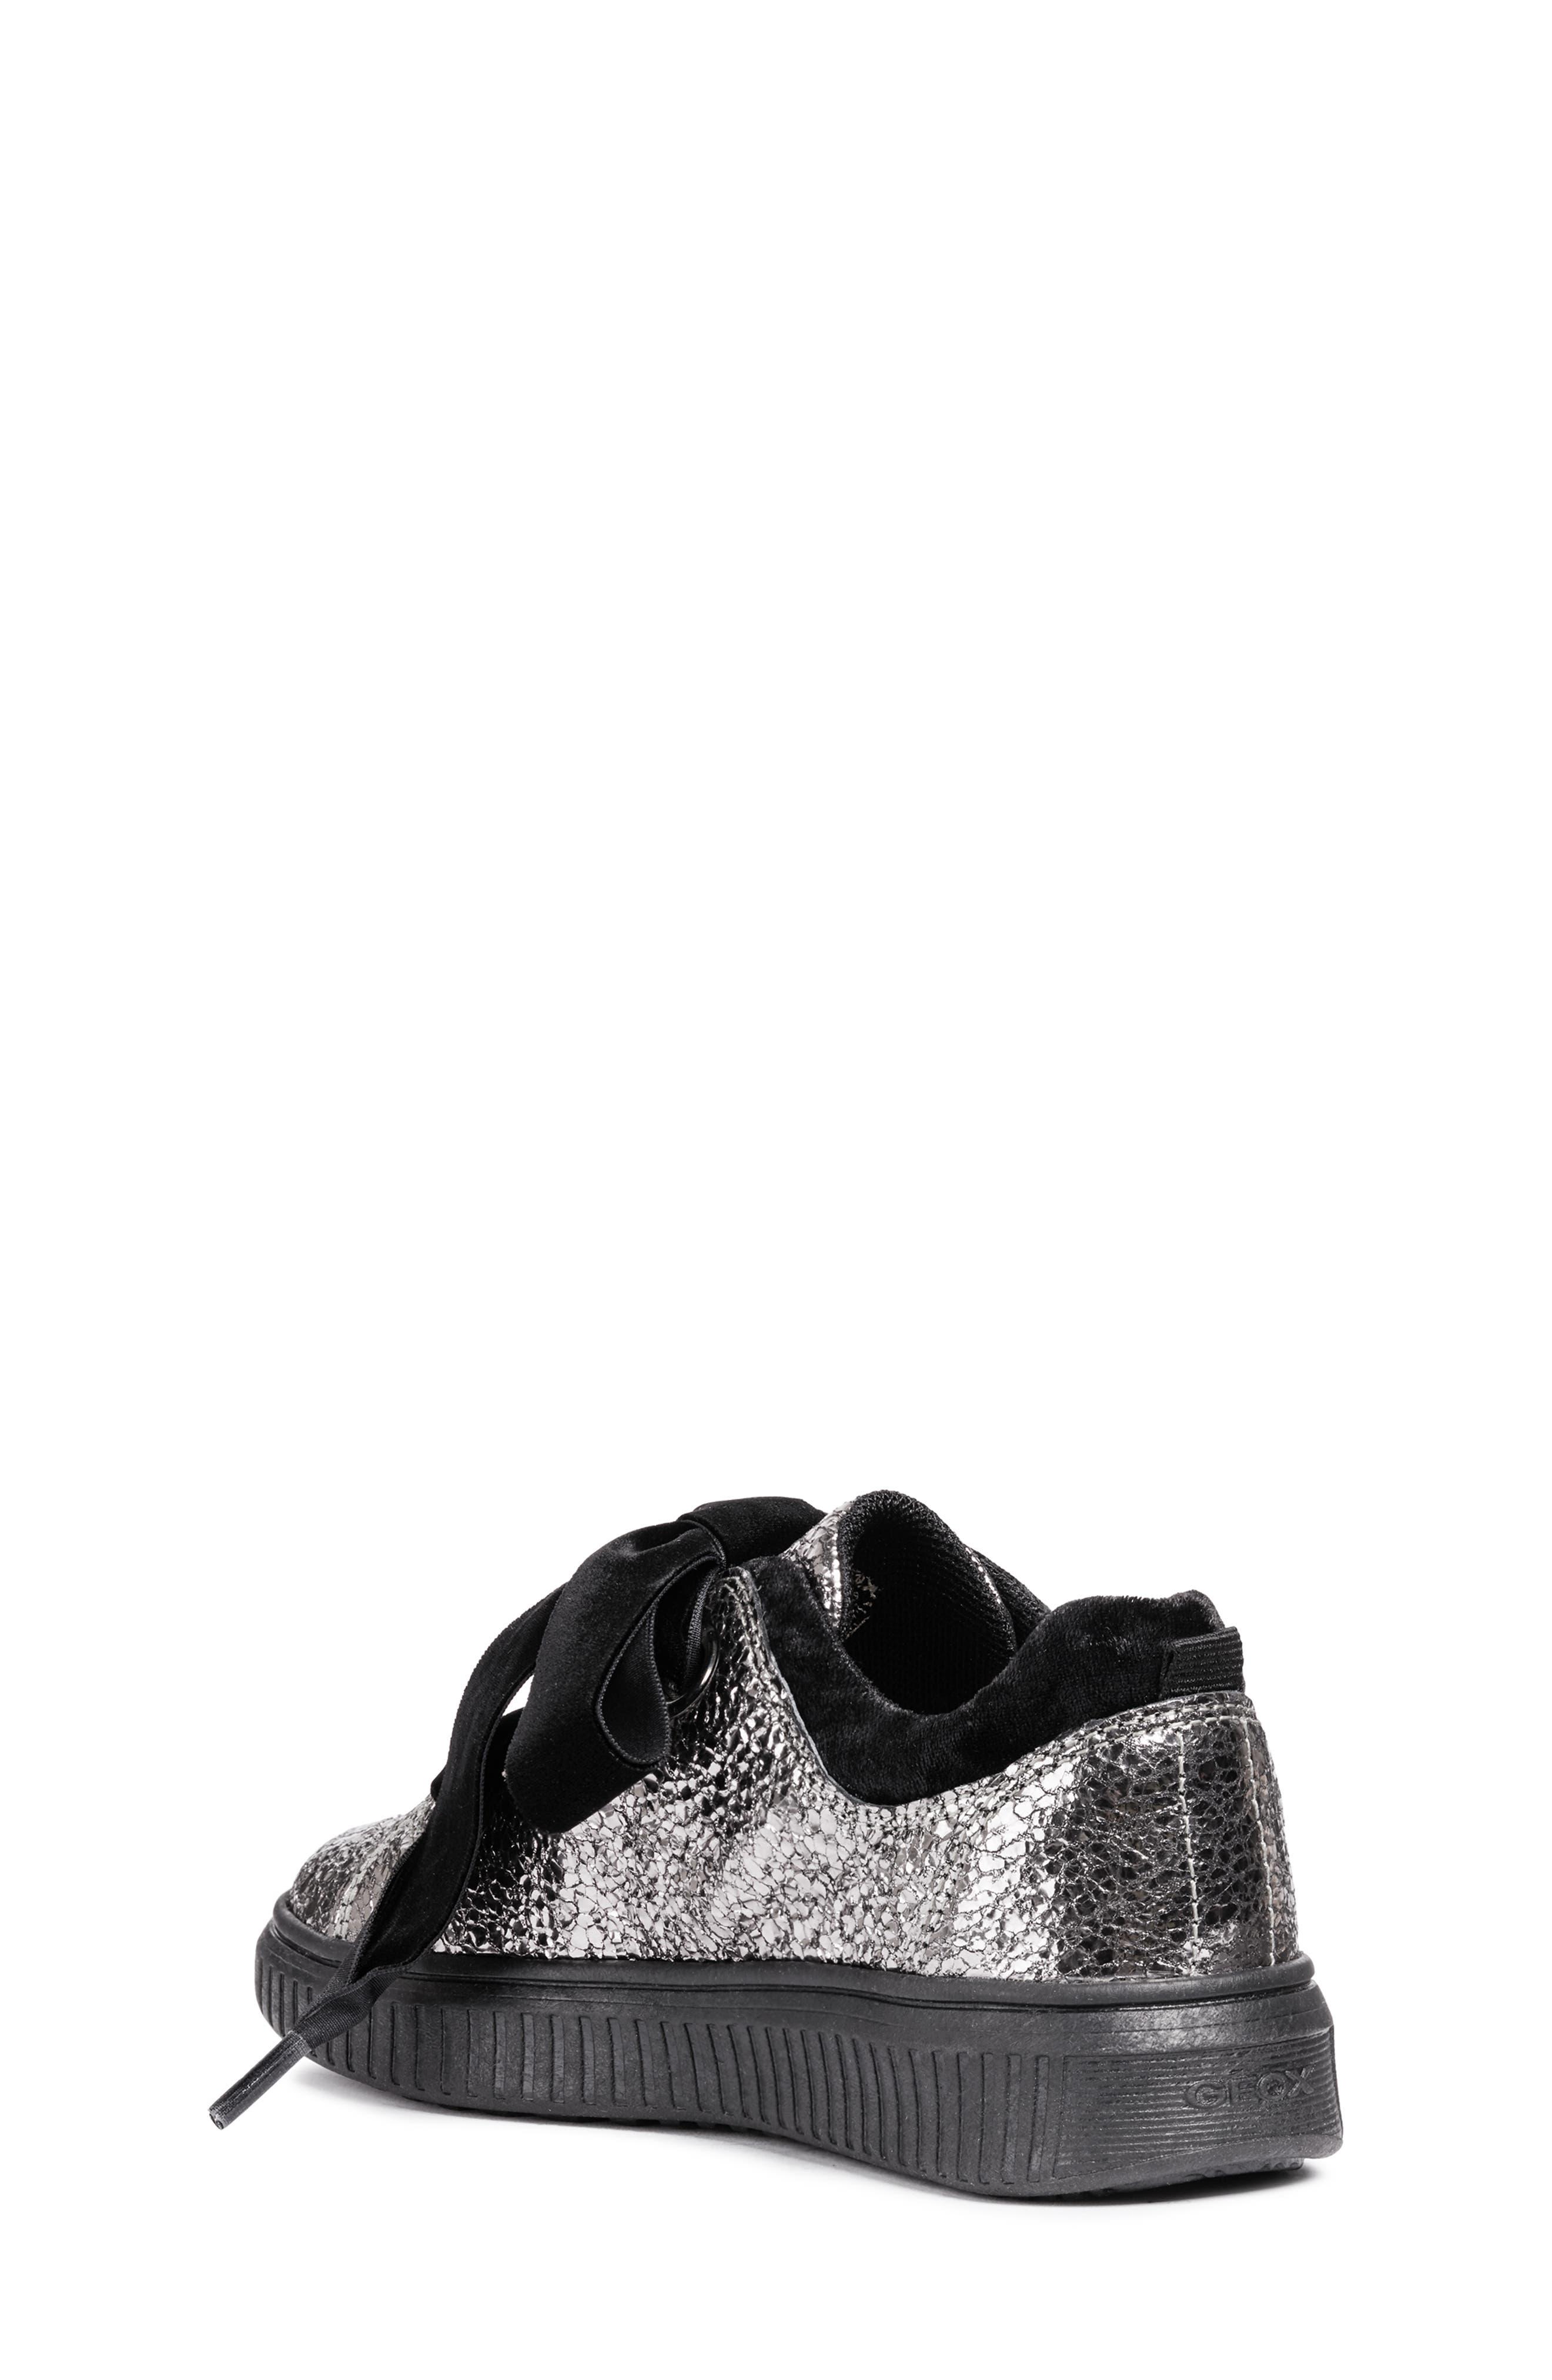 Disco Mix Sneaker,                             Alternate thumbnail 2, color,                             DARK SILVER